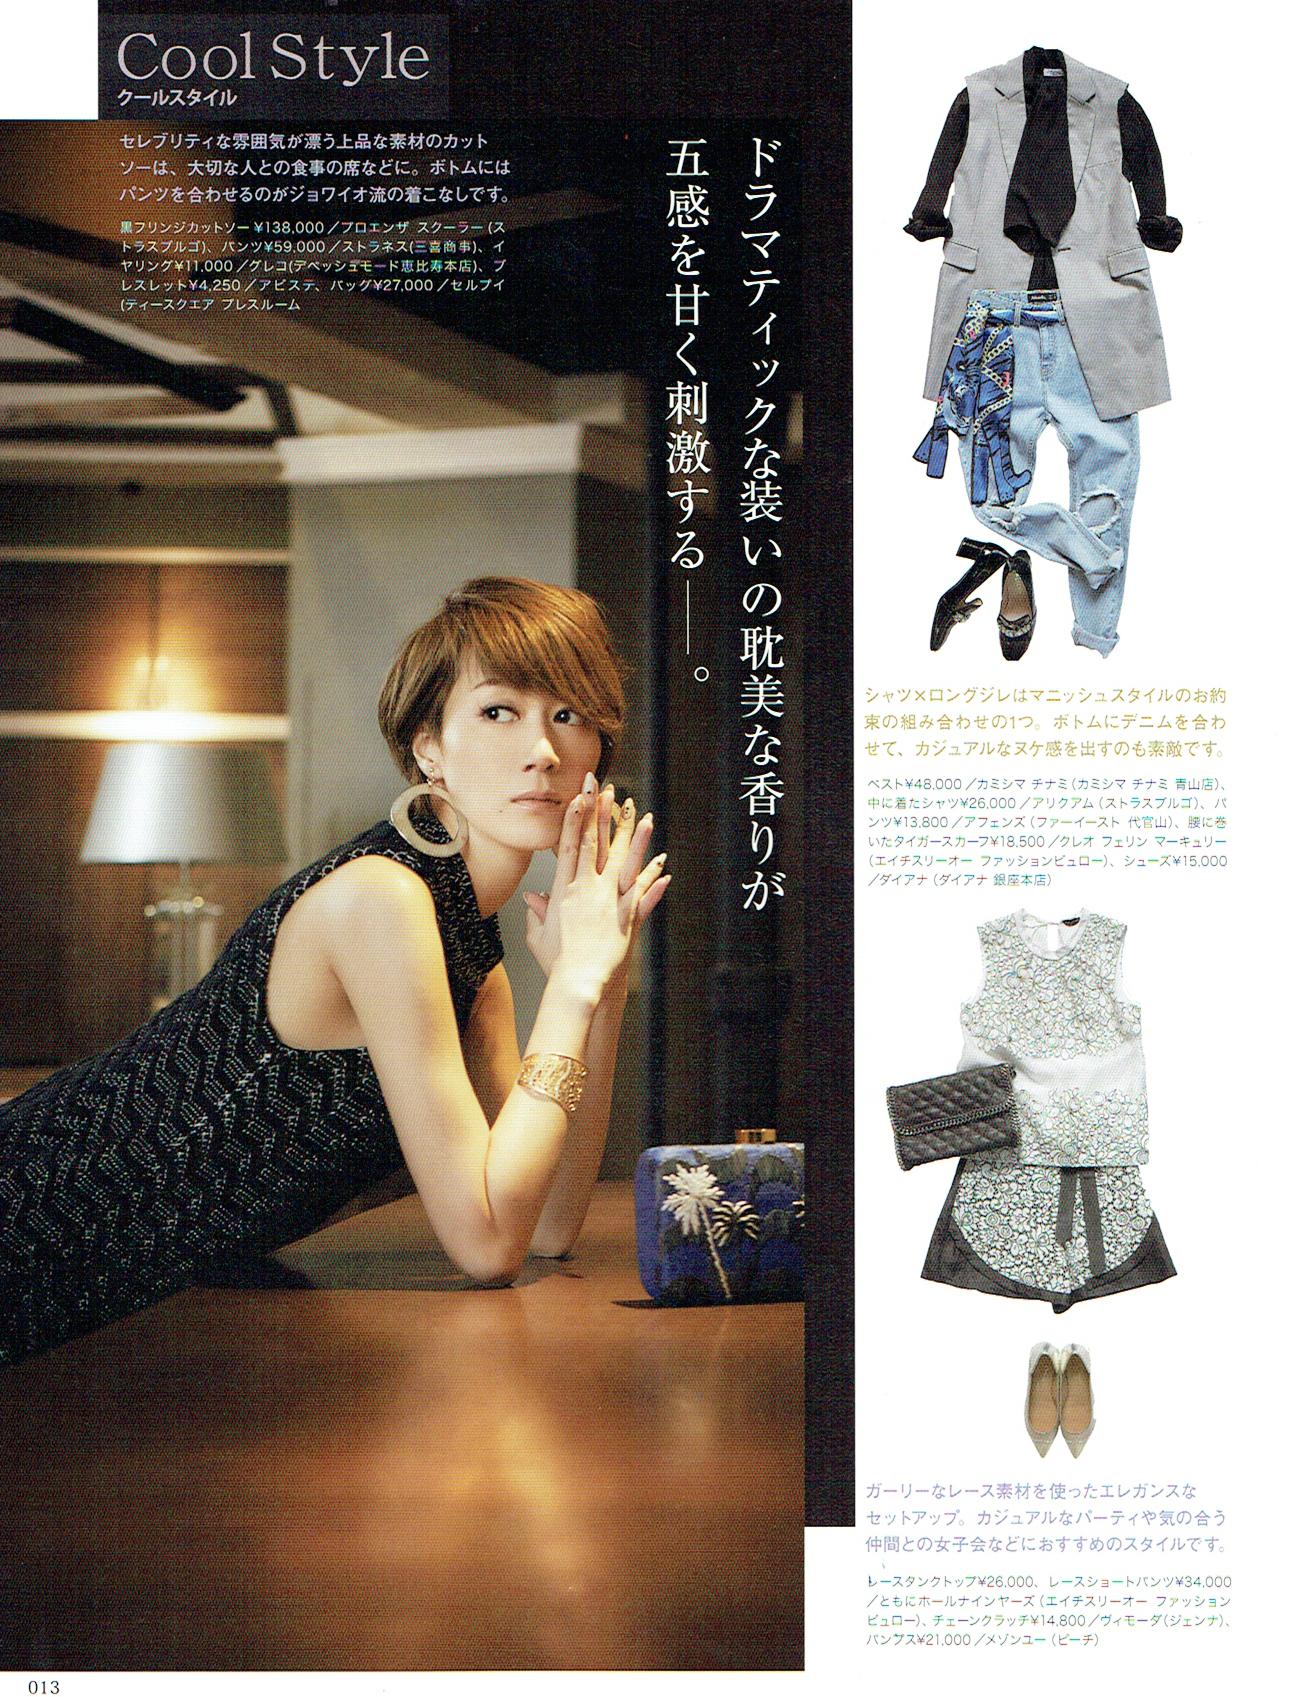 Small Tiger in Chains Designer Silk Scarf as seen in Joyau Magazine